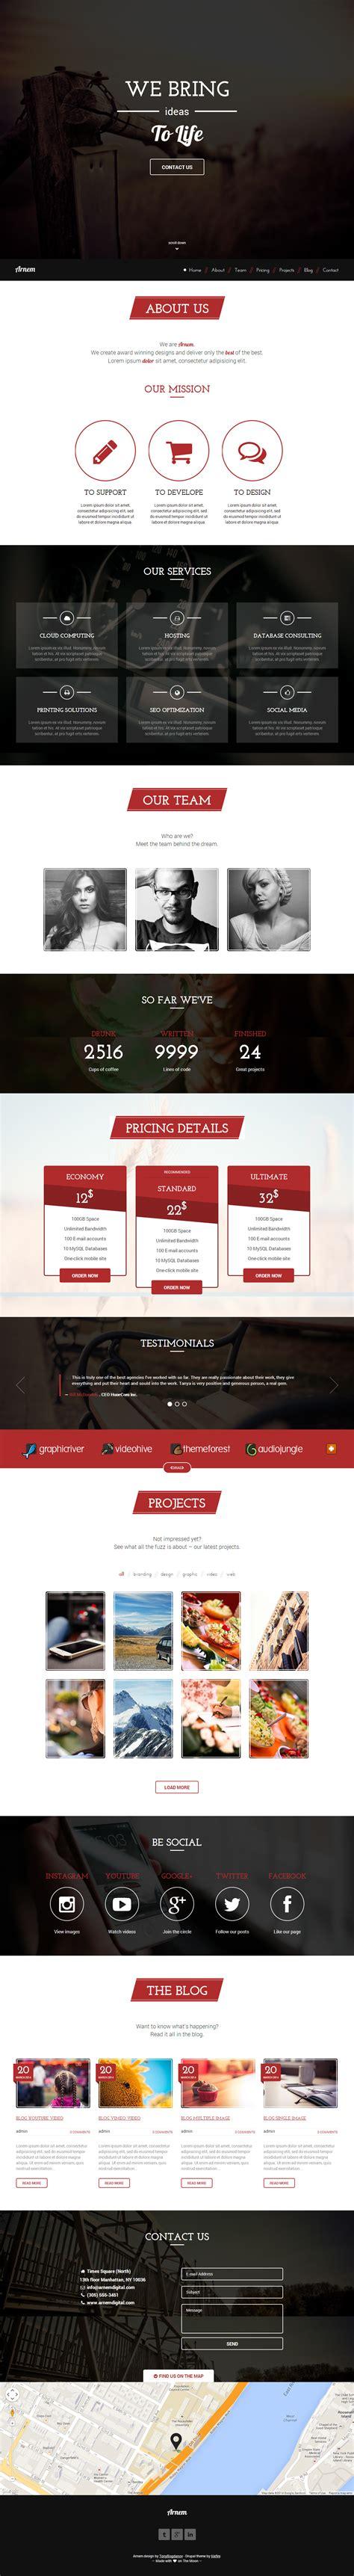 drupal themes responsive parallax free arnem premium responsive retina one page parallax drupal